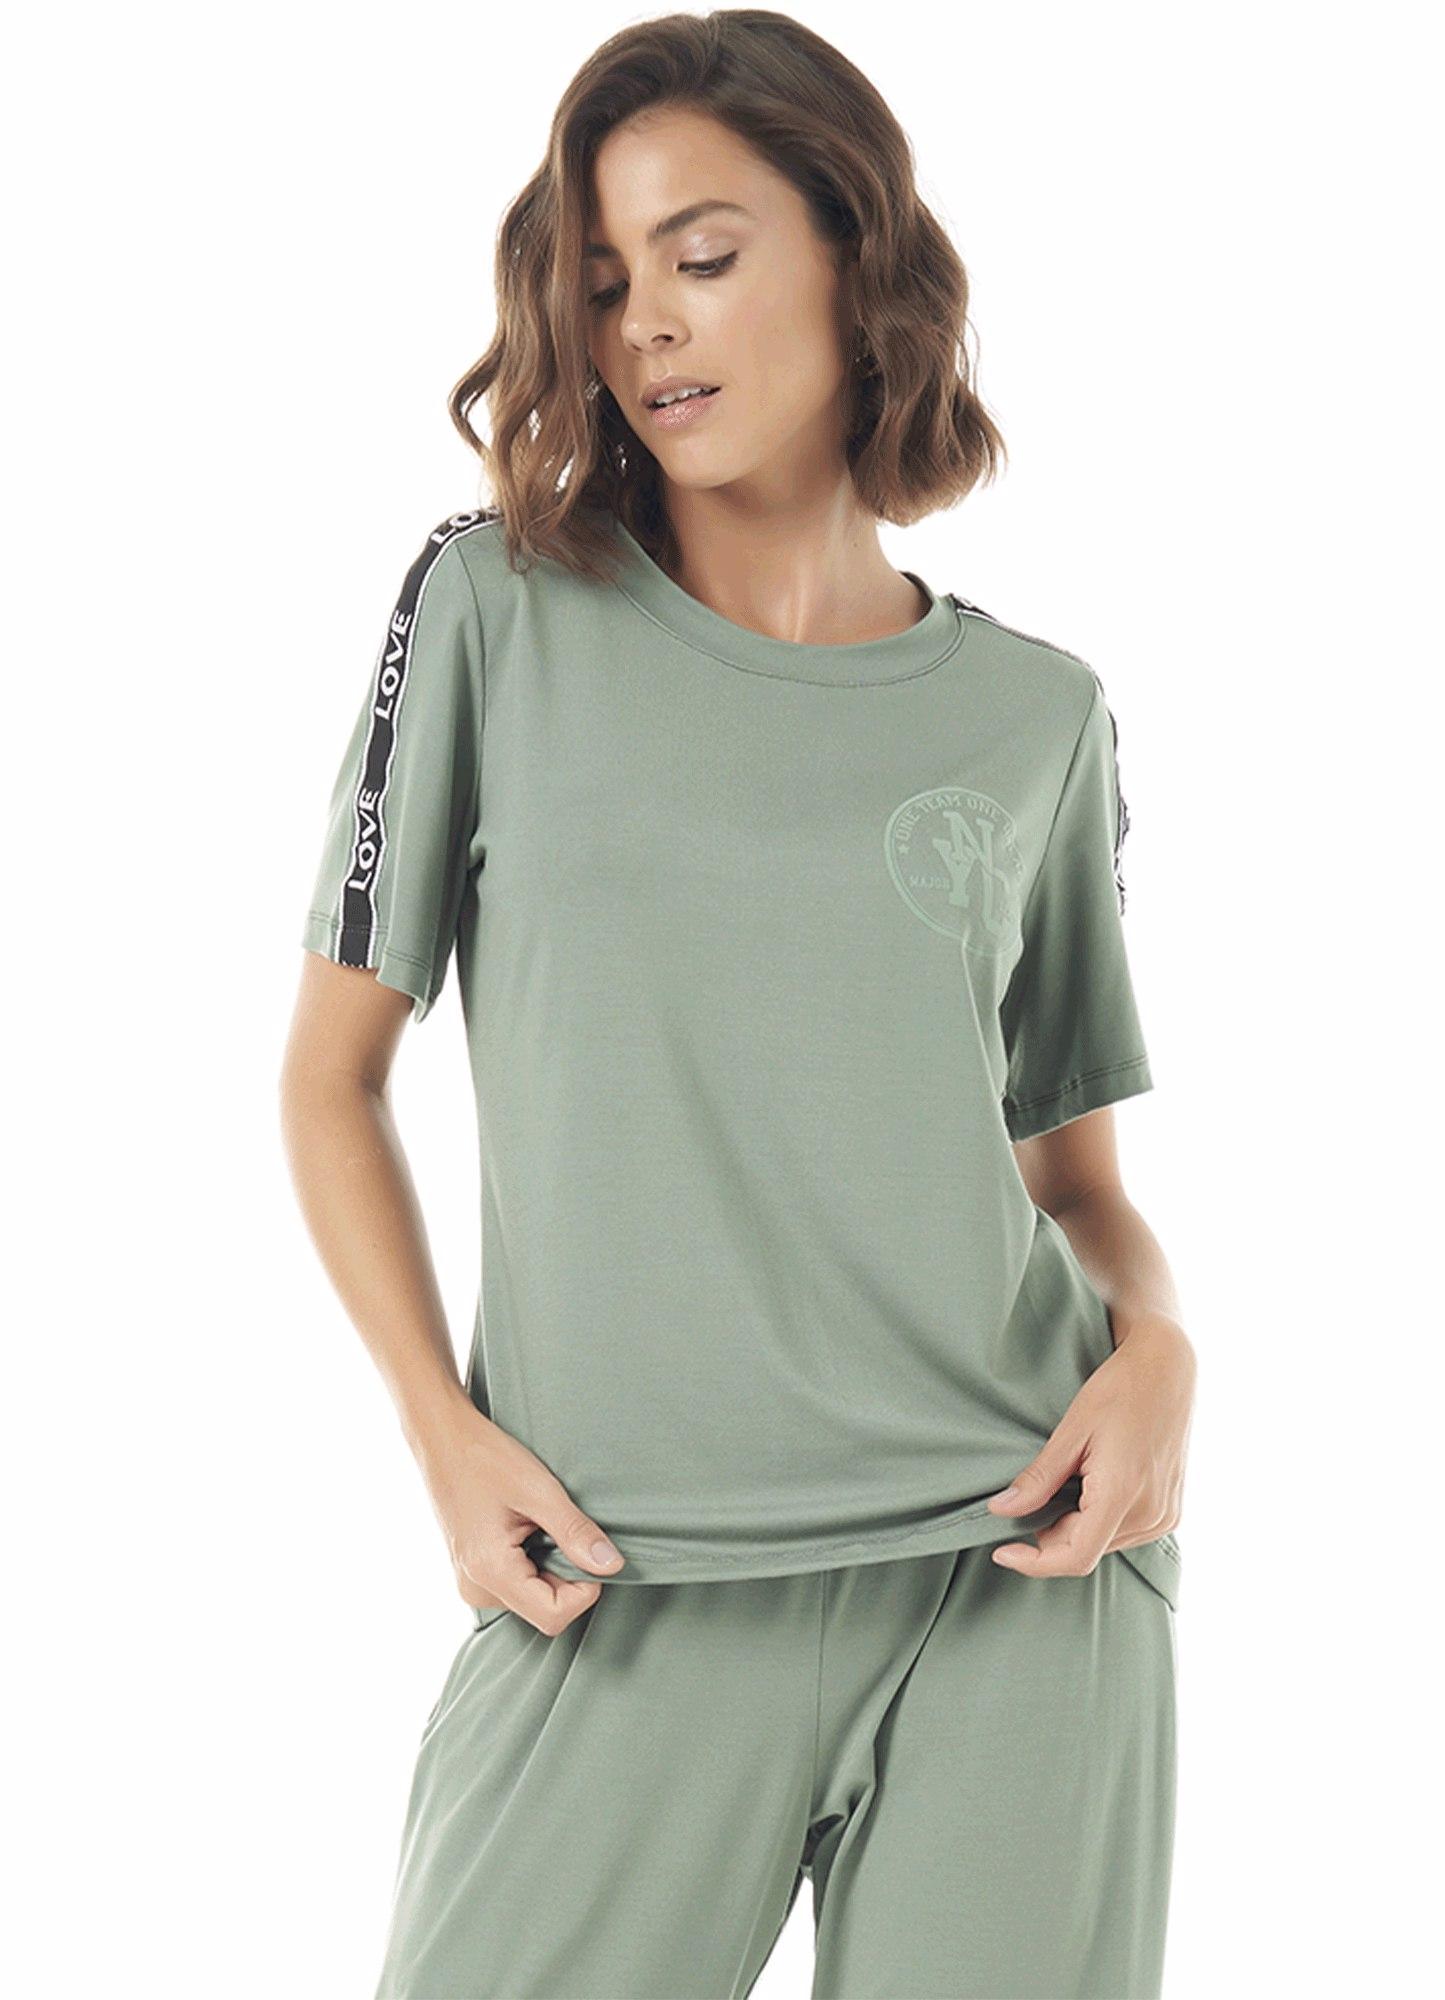 Blusa Feminina Viscose Verde Slim Estampada Decote Redondo